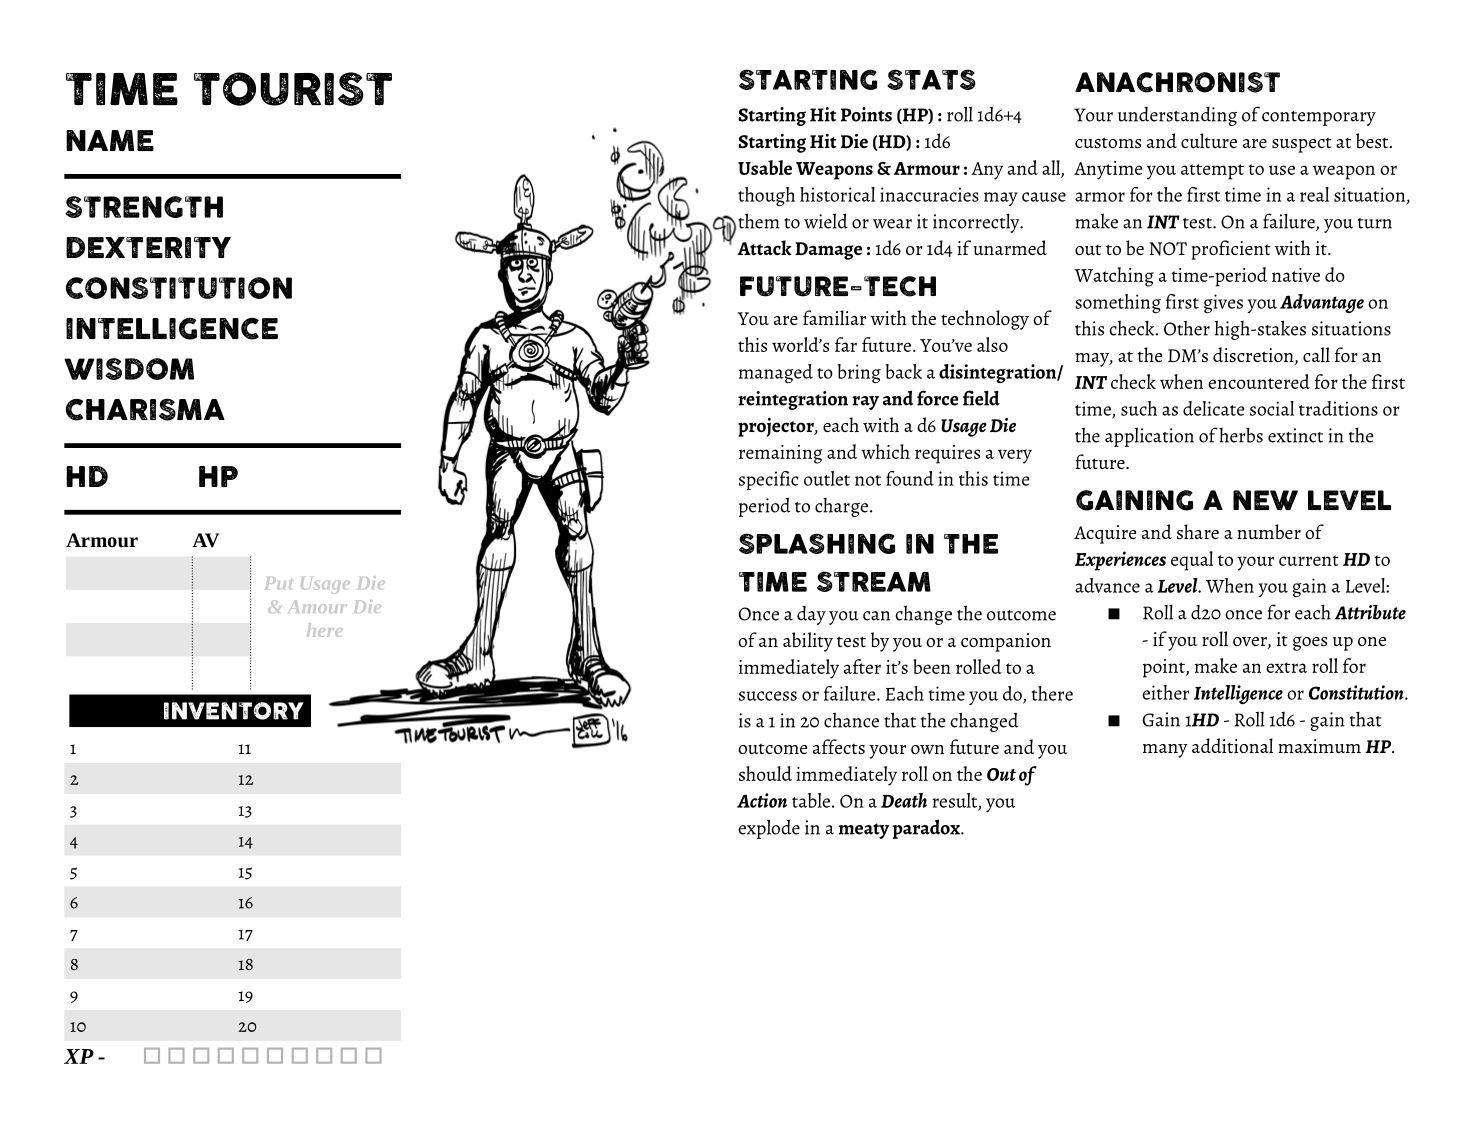 bh_timetourist